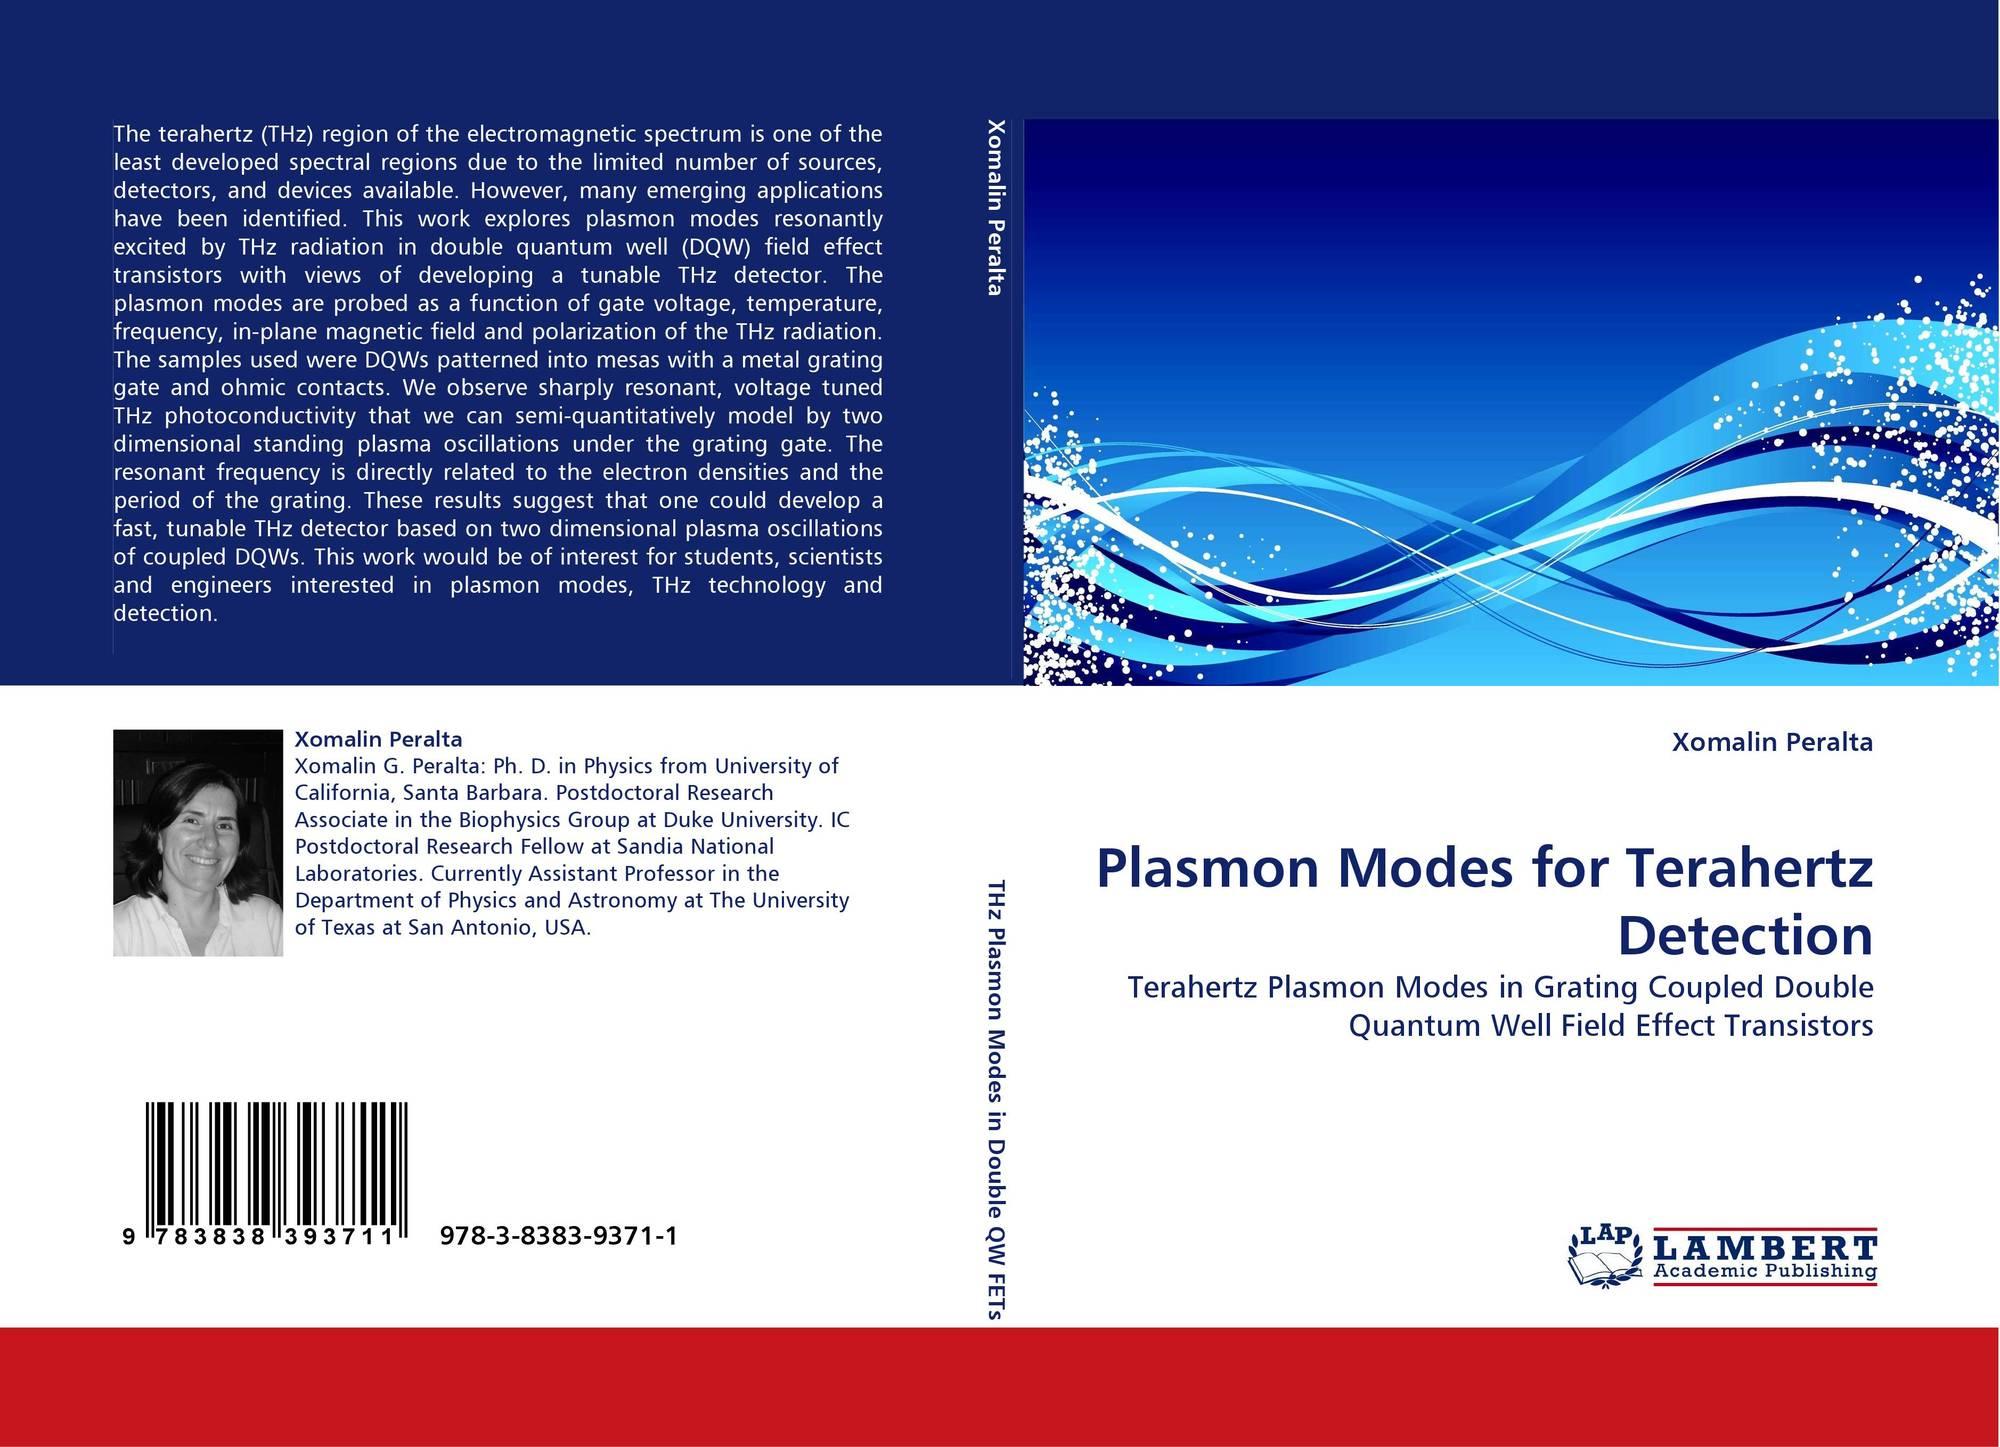 Plasmon Modes For Terahertz Detection 978 3 8383 9371 1 3838393716 Transistors 9783838393711